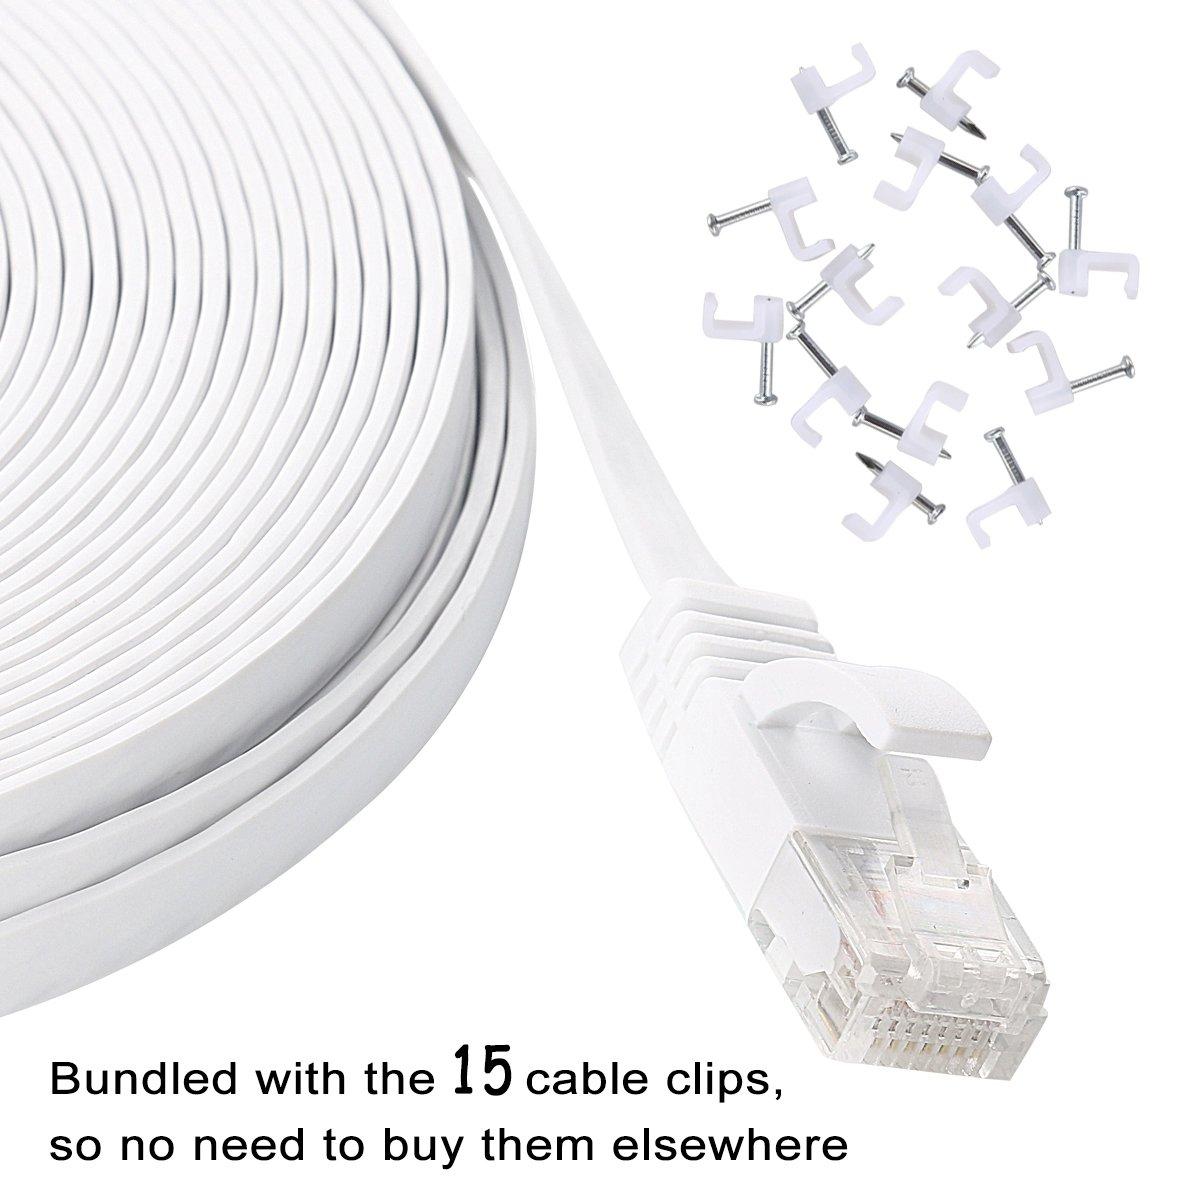 Amazon.com: Cat 6 Ethernet Cable 50 ft White – Flat Internet Network ...